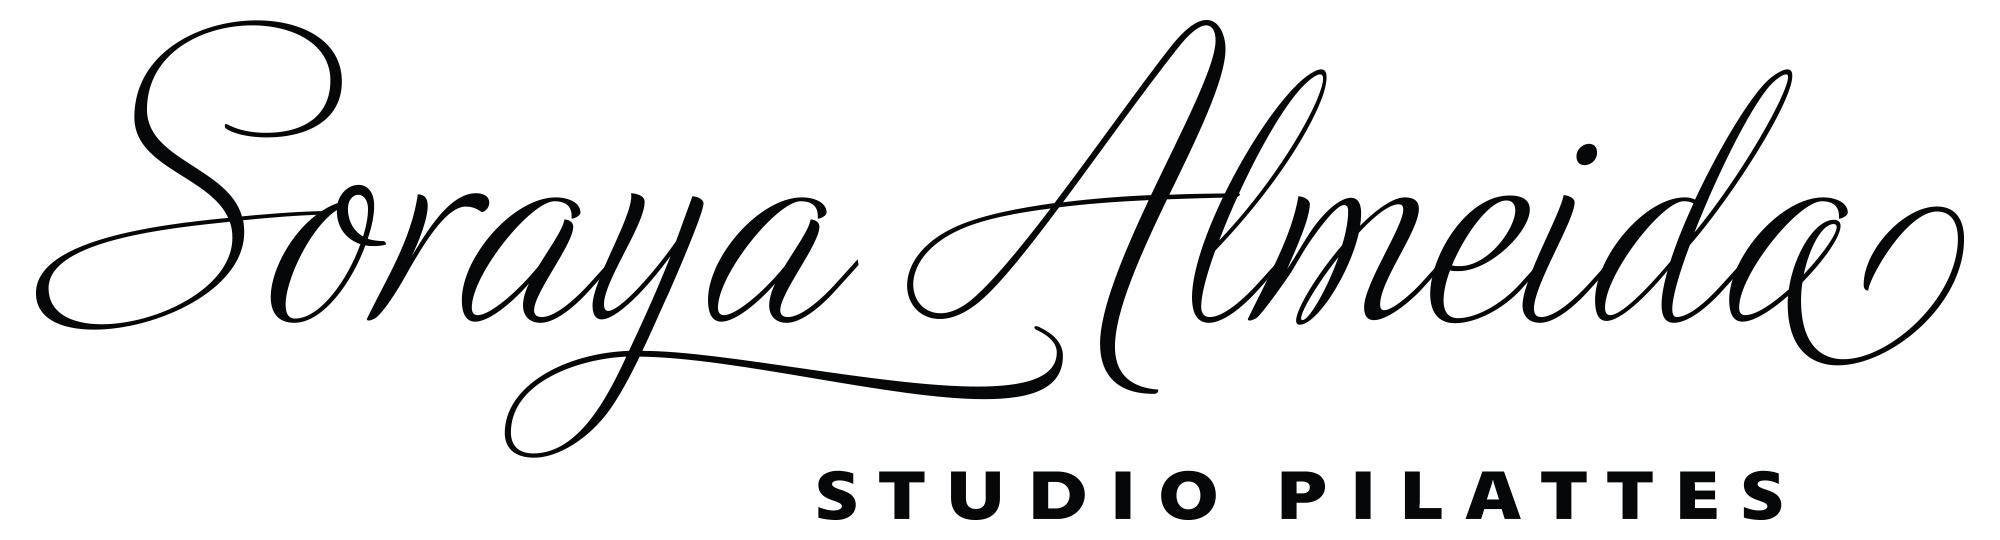 SORAYA ALMEIDA STUDIO PILATTES